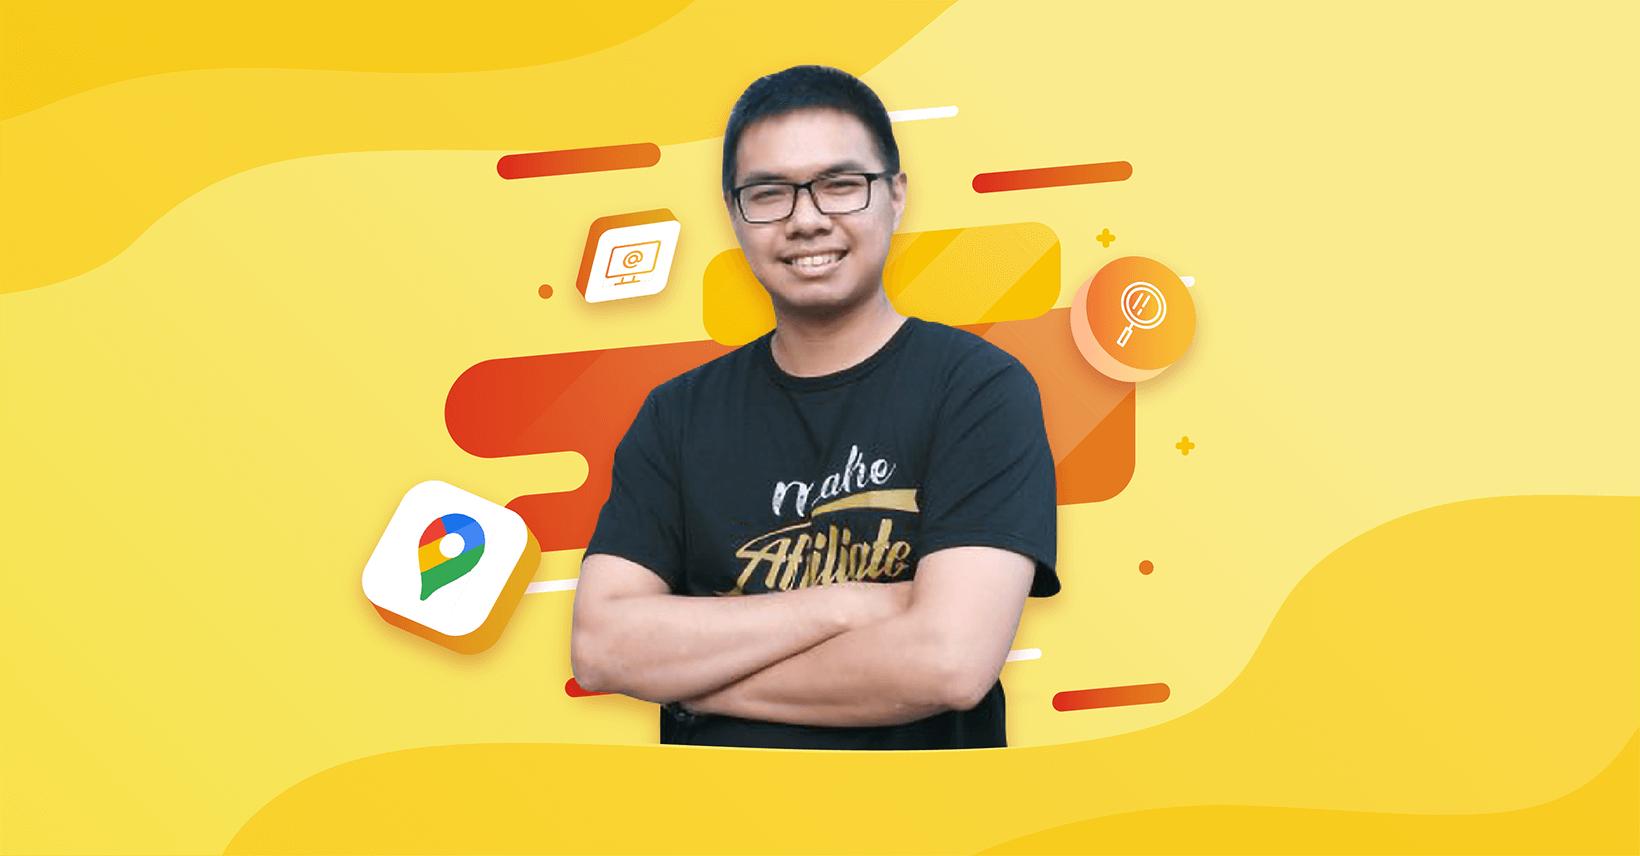 Khoa Hoc Seo Google Maps 2020 Tiep Can Tren 1000 Khach Hang Vao Shop Moi Thang Voi Chi Phi 0 Dong Gia Tang Doanh So Tu 30 50 Trieu 1